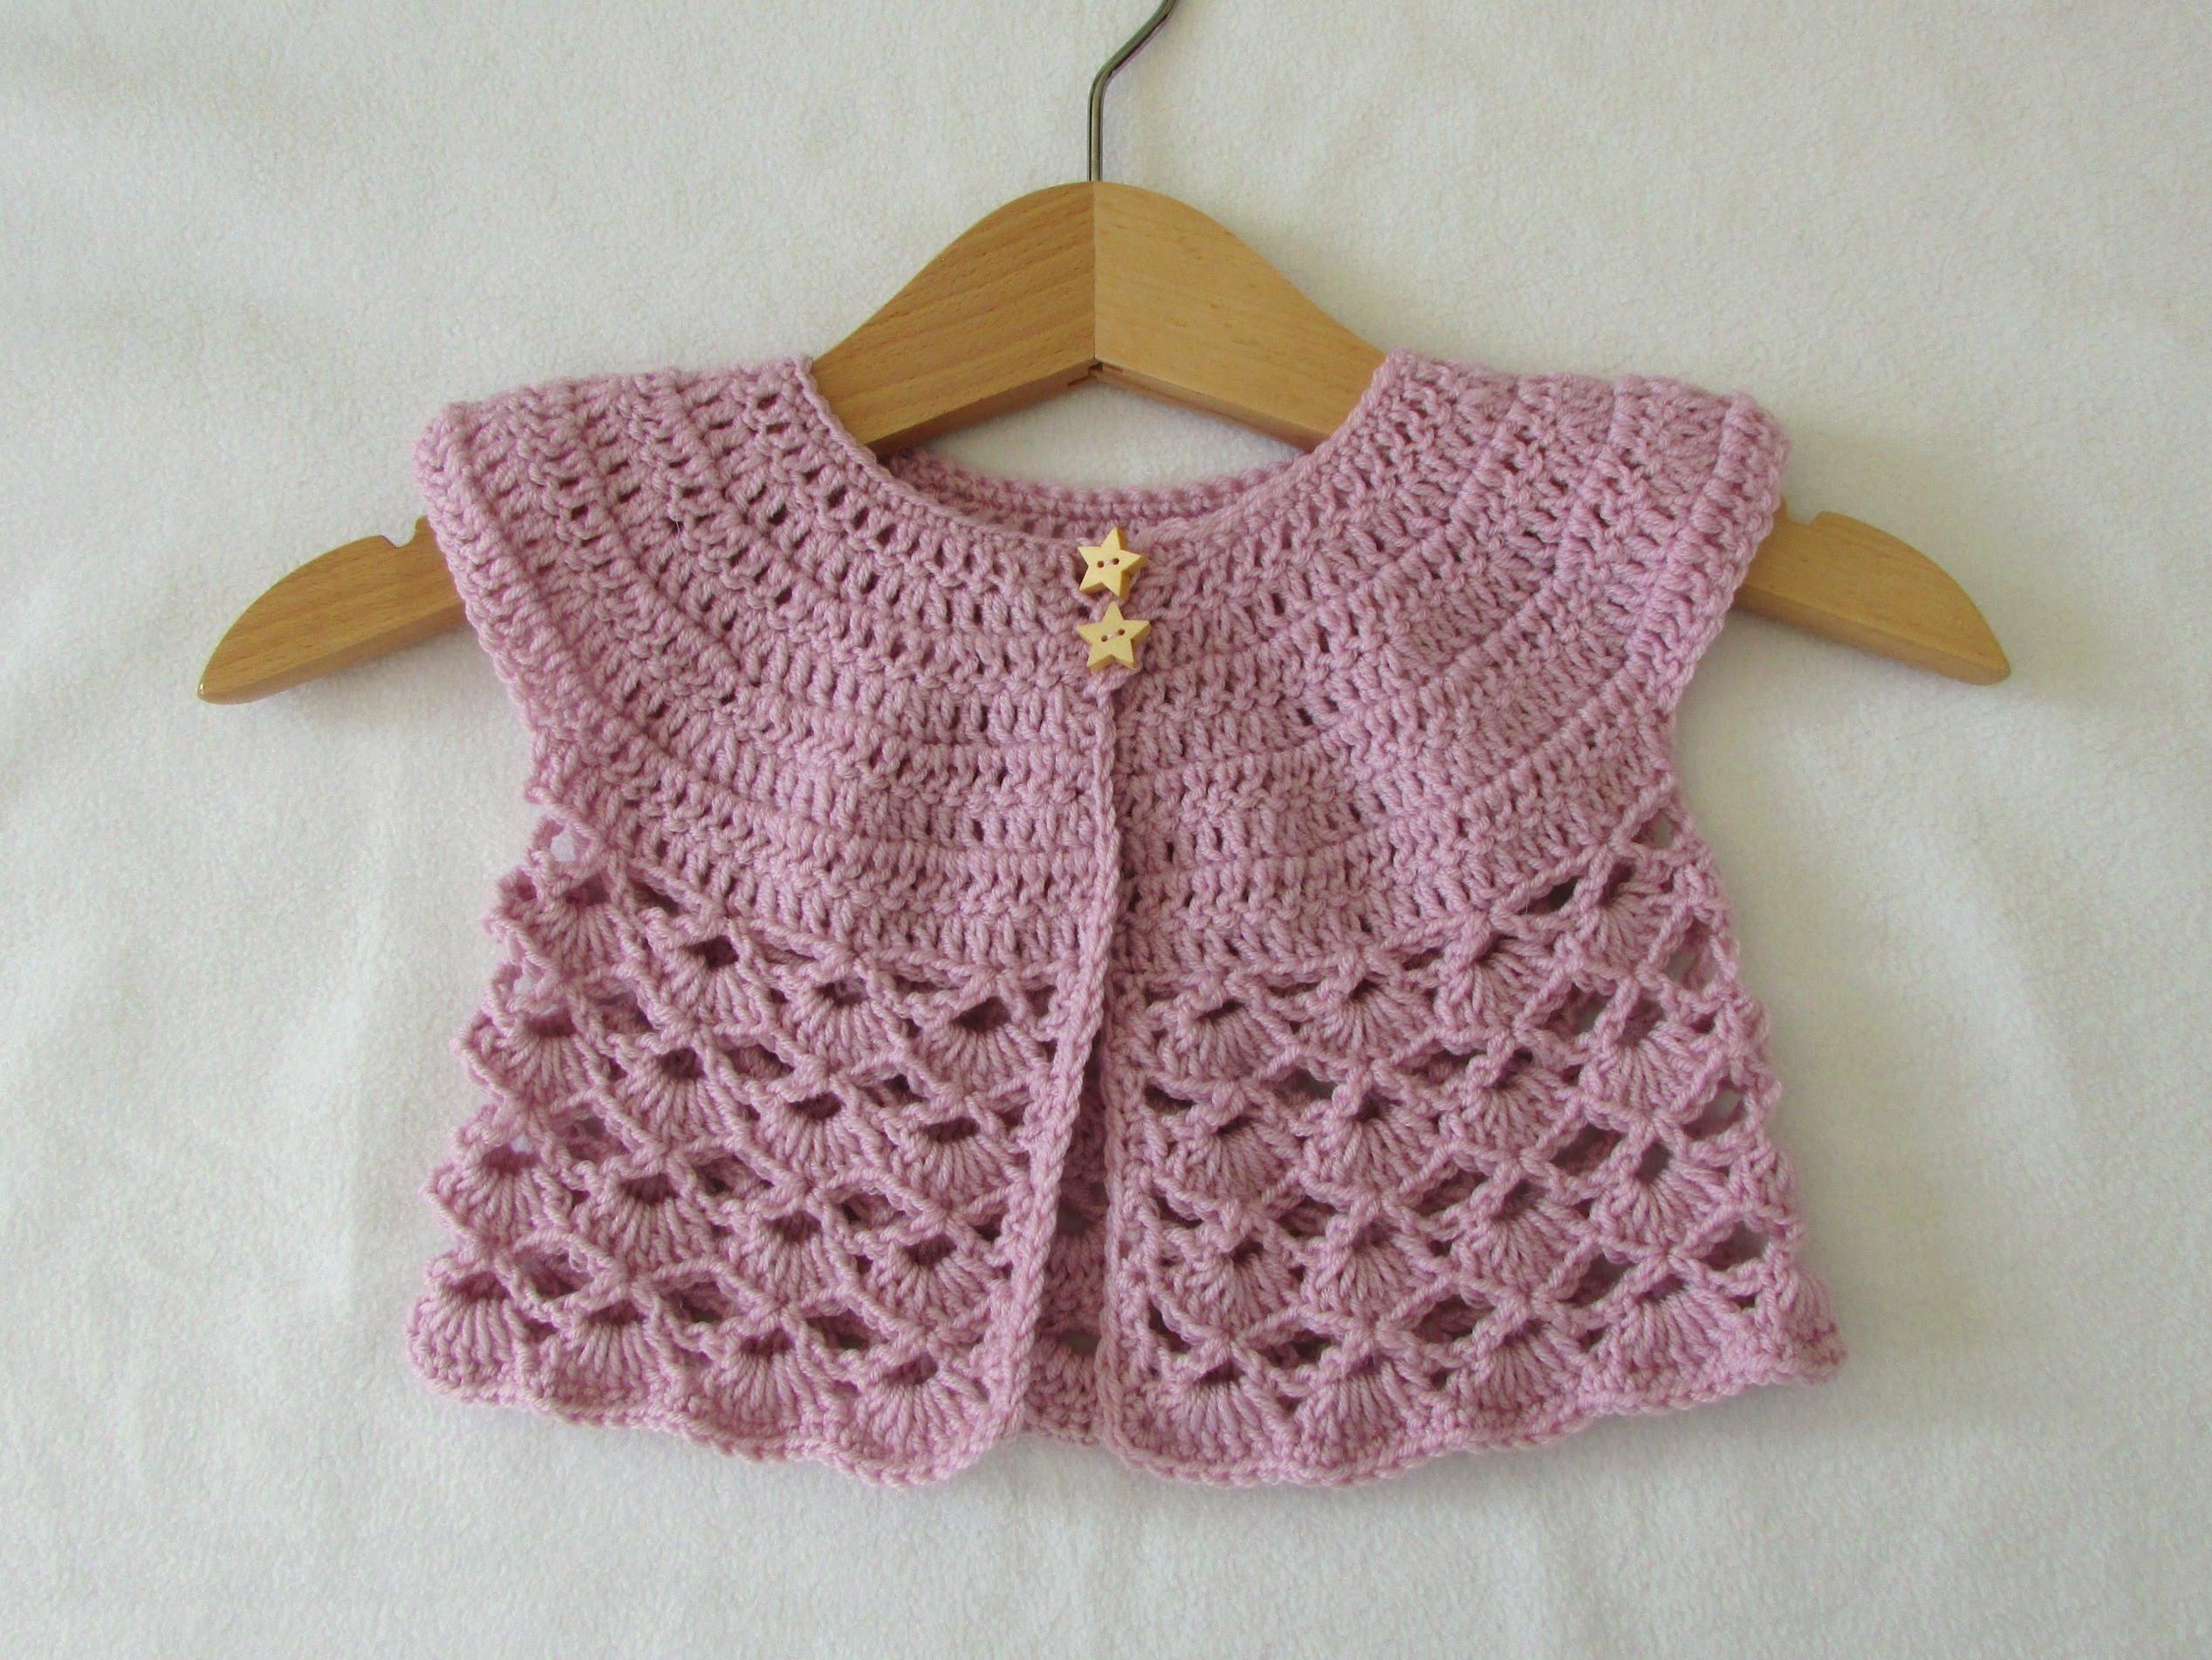 Easy to crochet baby cardigan